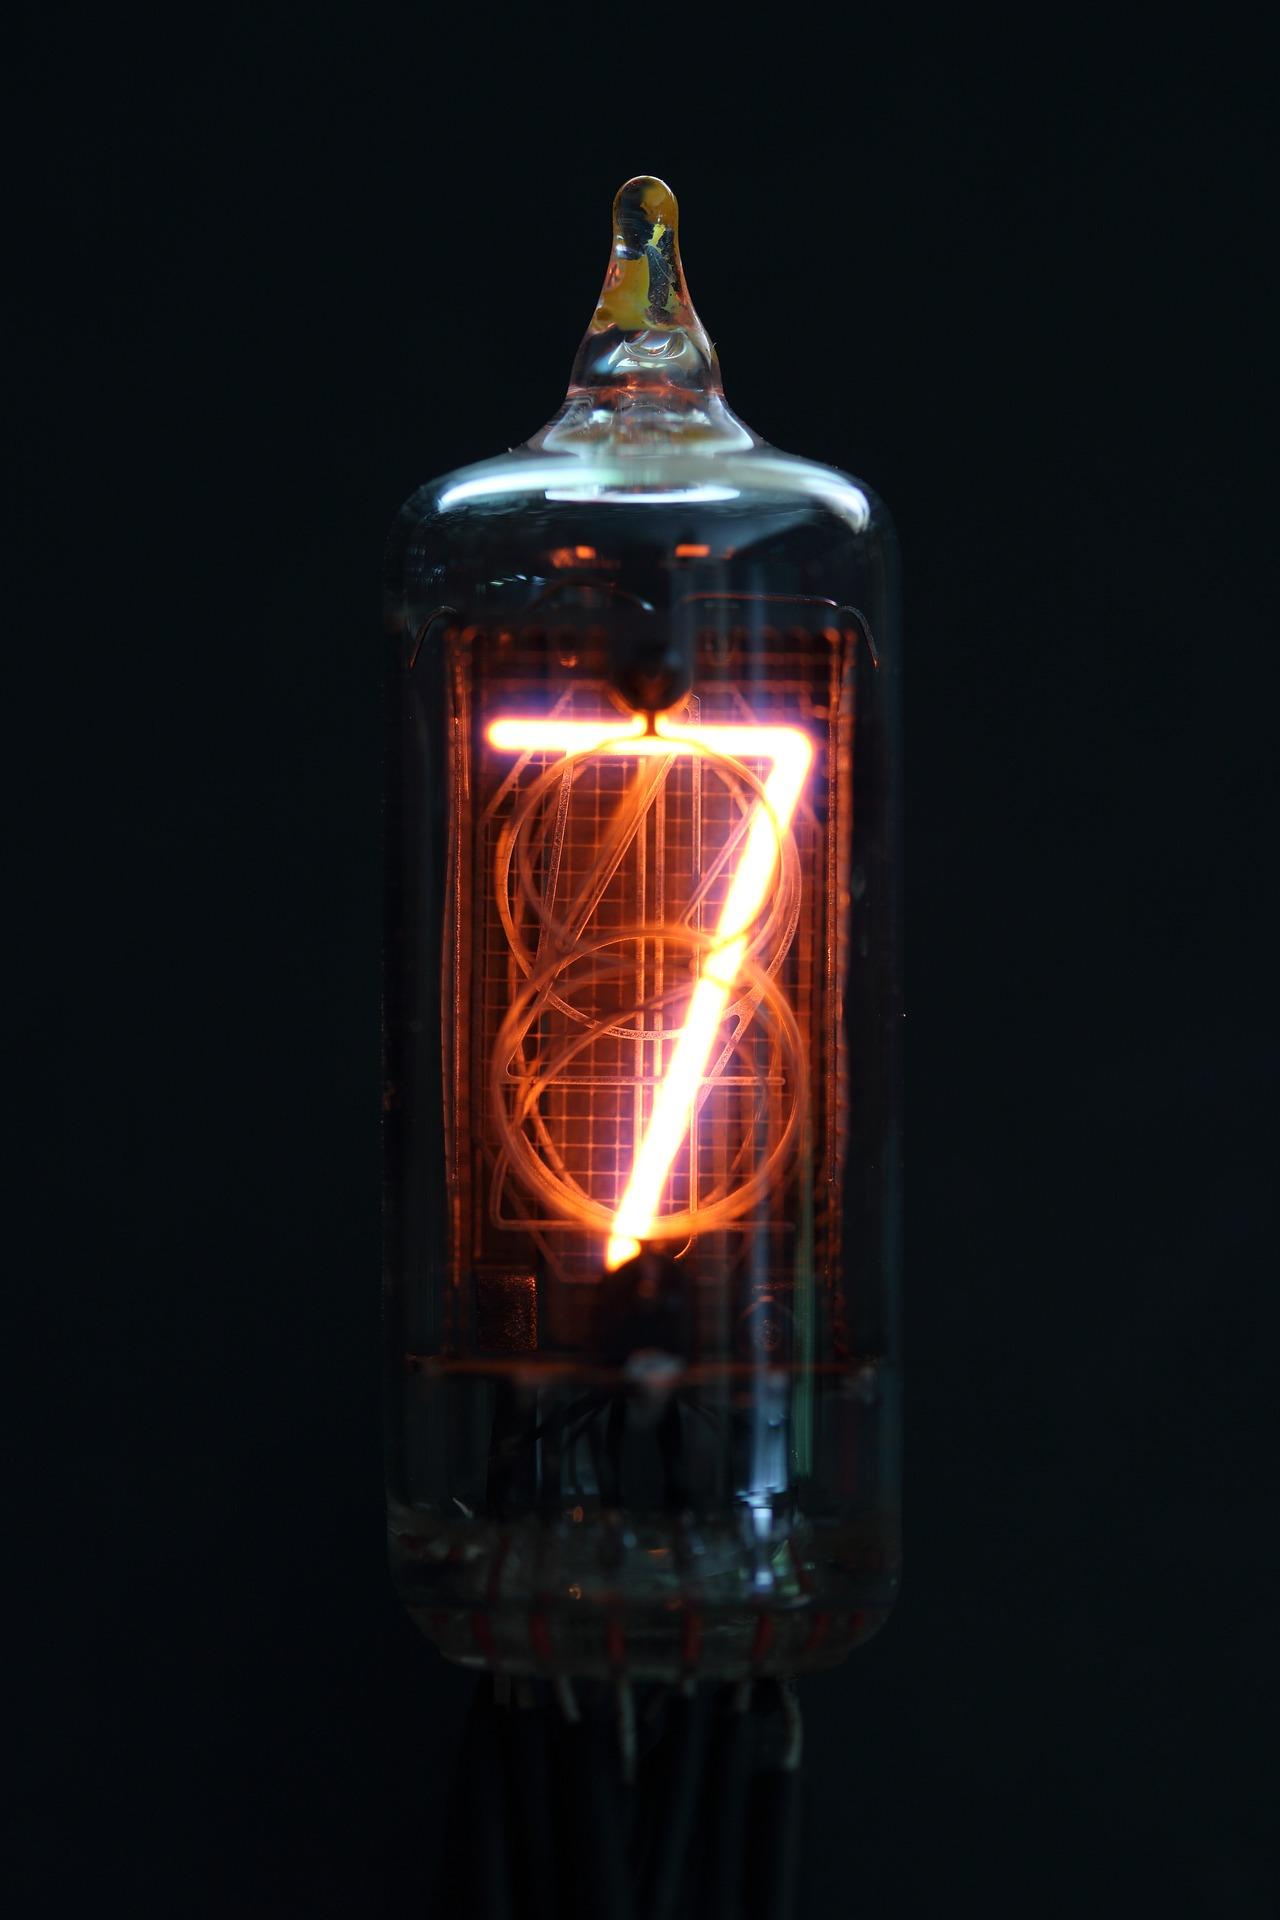 ethereum 7 nixie-3407310_1920